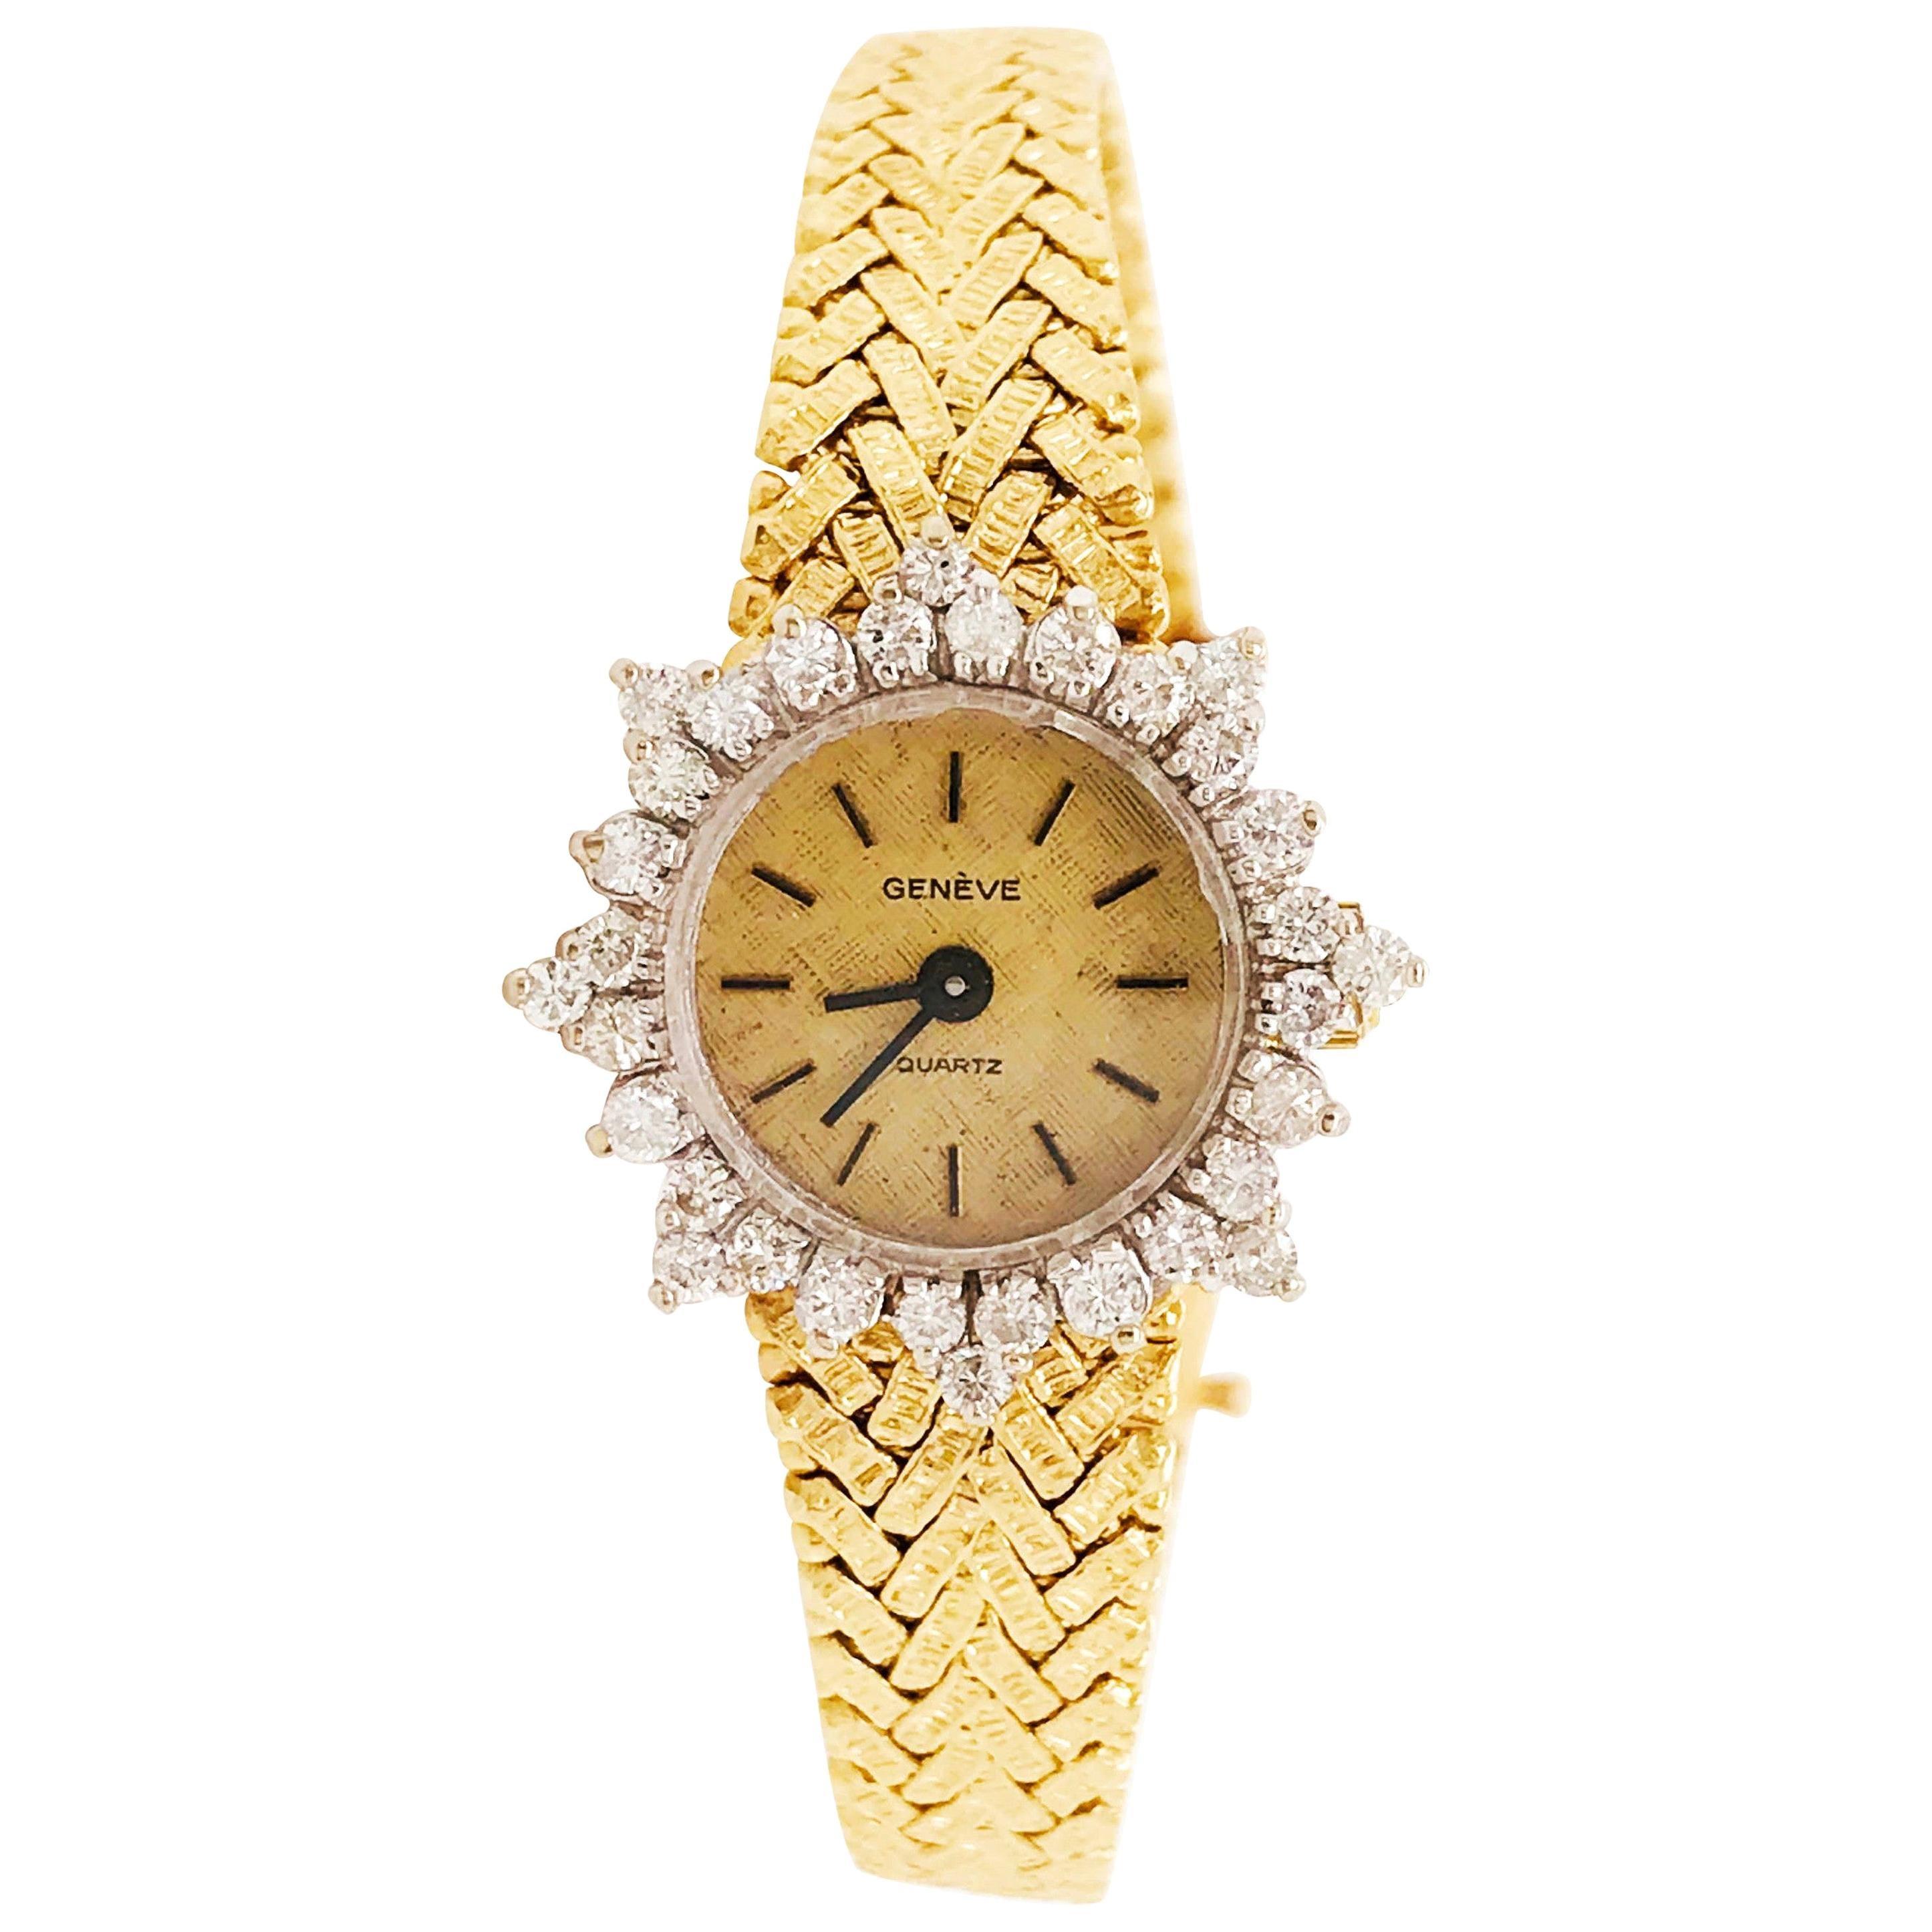 1.50 Carat Diamond Bezel Geneve Quartz Ladies Gold Watch, 14 Karat Yellow Gold